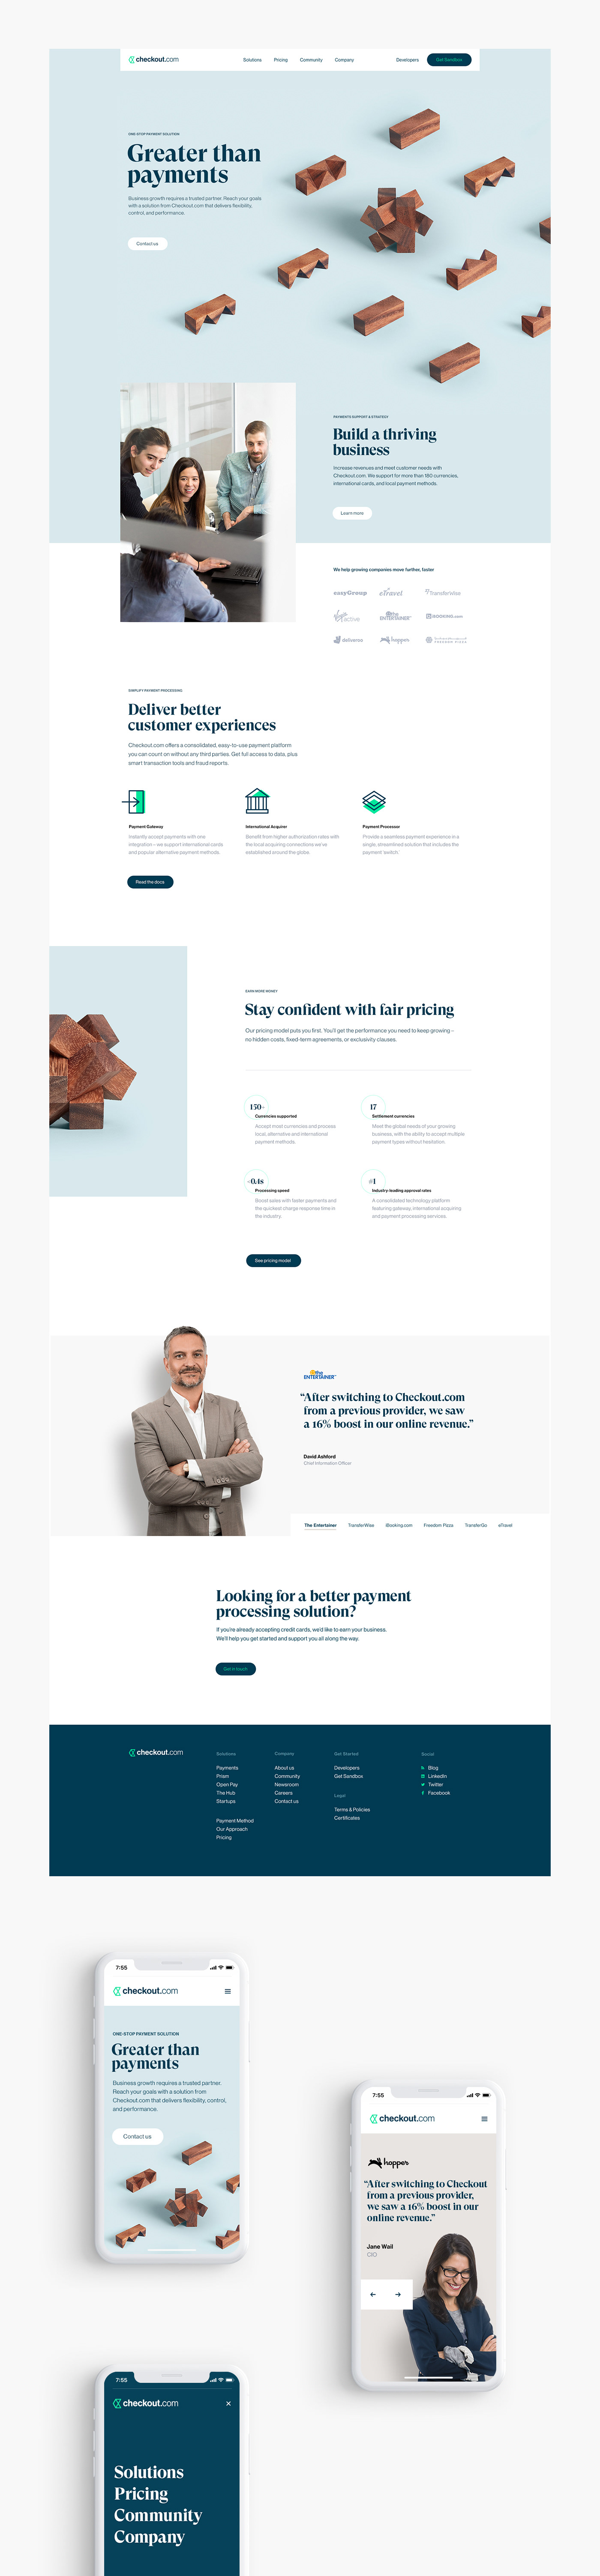 Fintech finance branding  interactive service b2b Rebrand business Startup typography